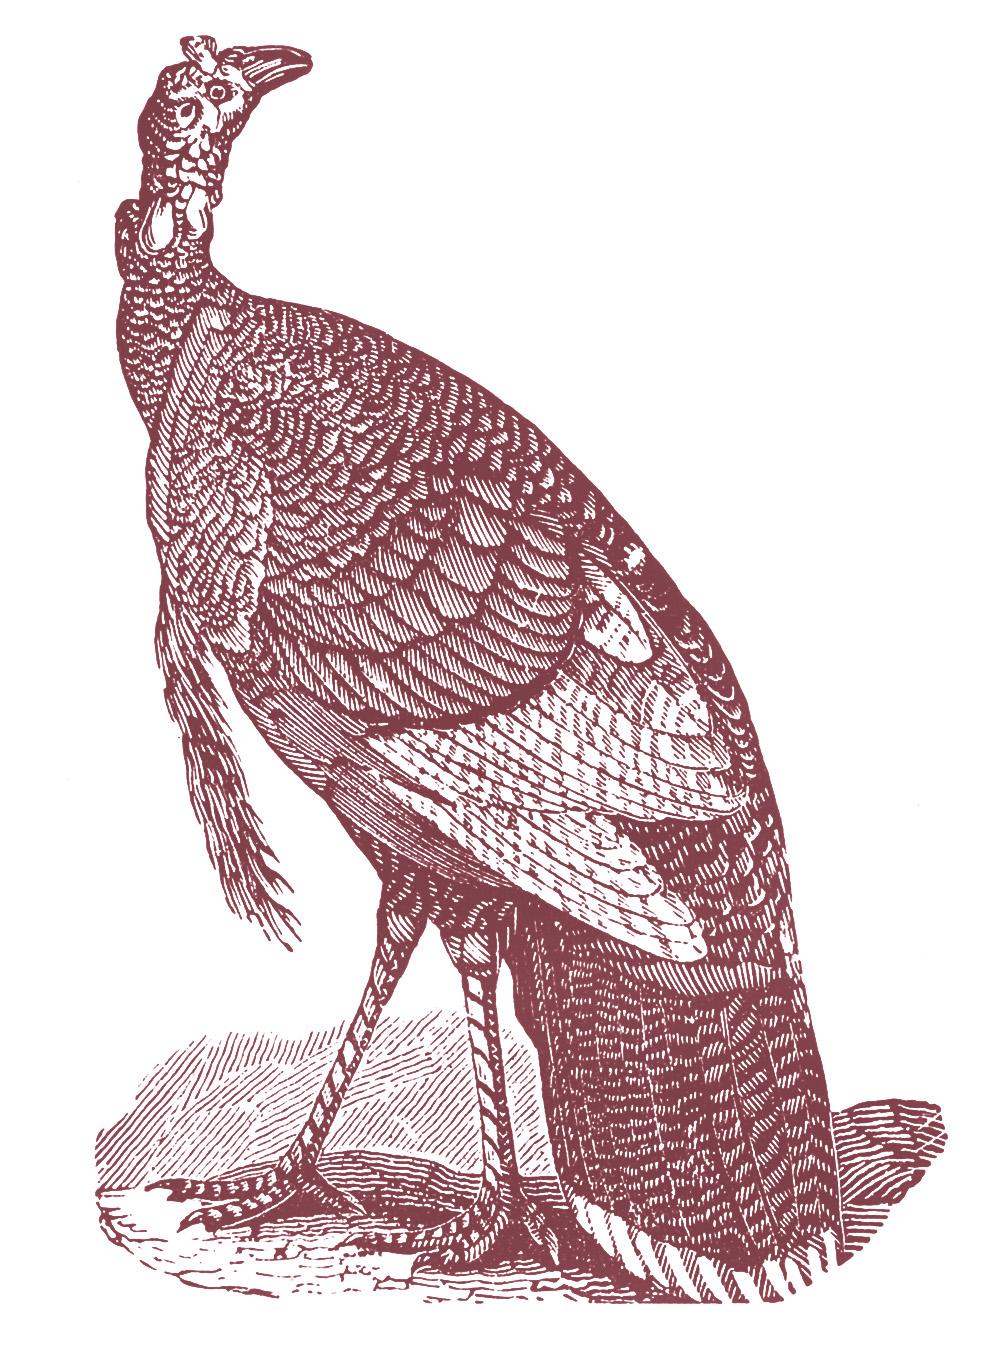 Vintage Thanksgiving Clip Art - Turkeys - The Graphics Fairy